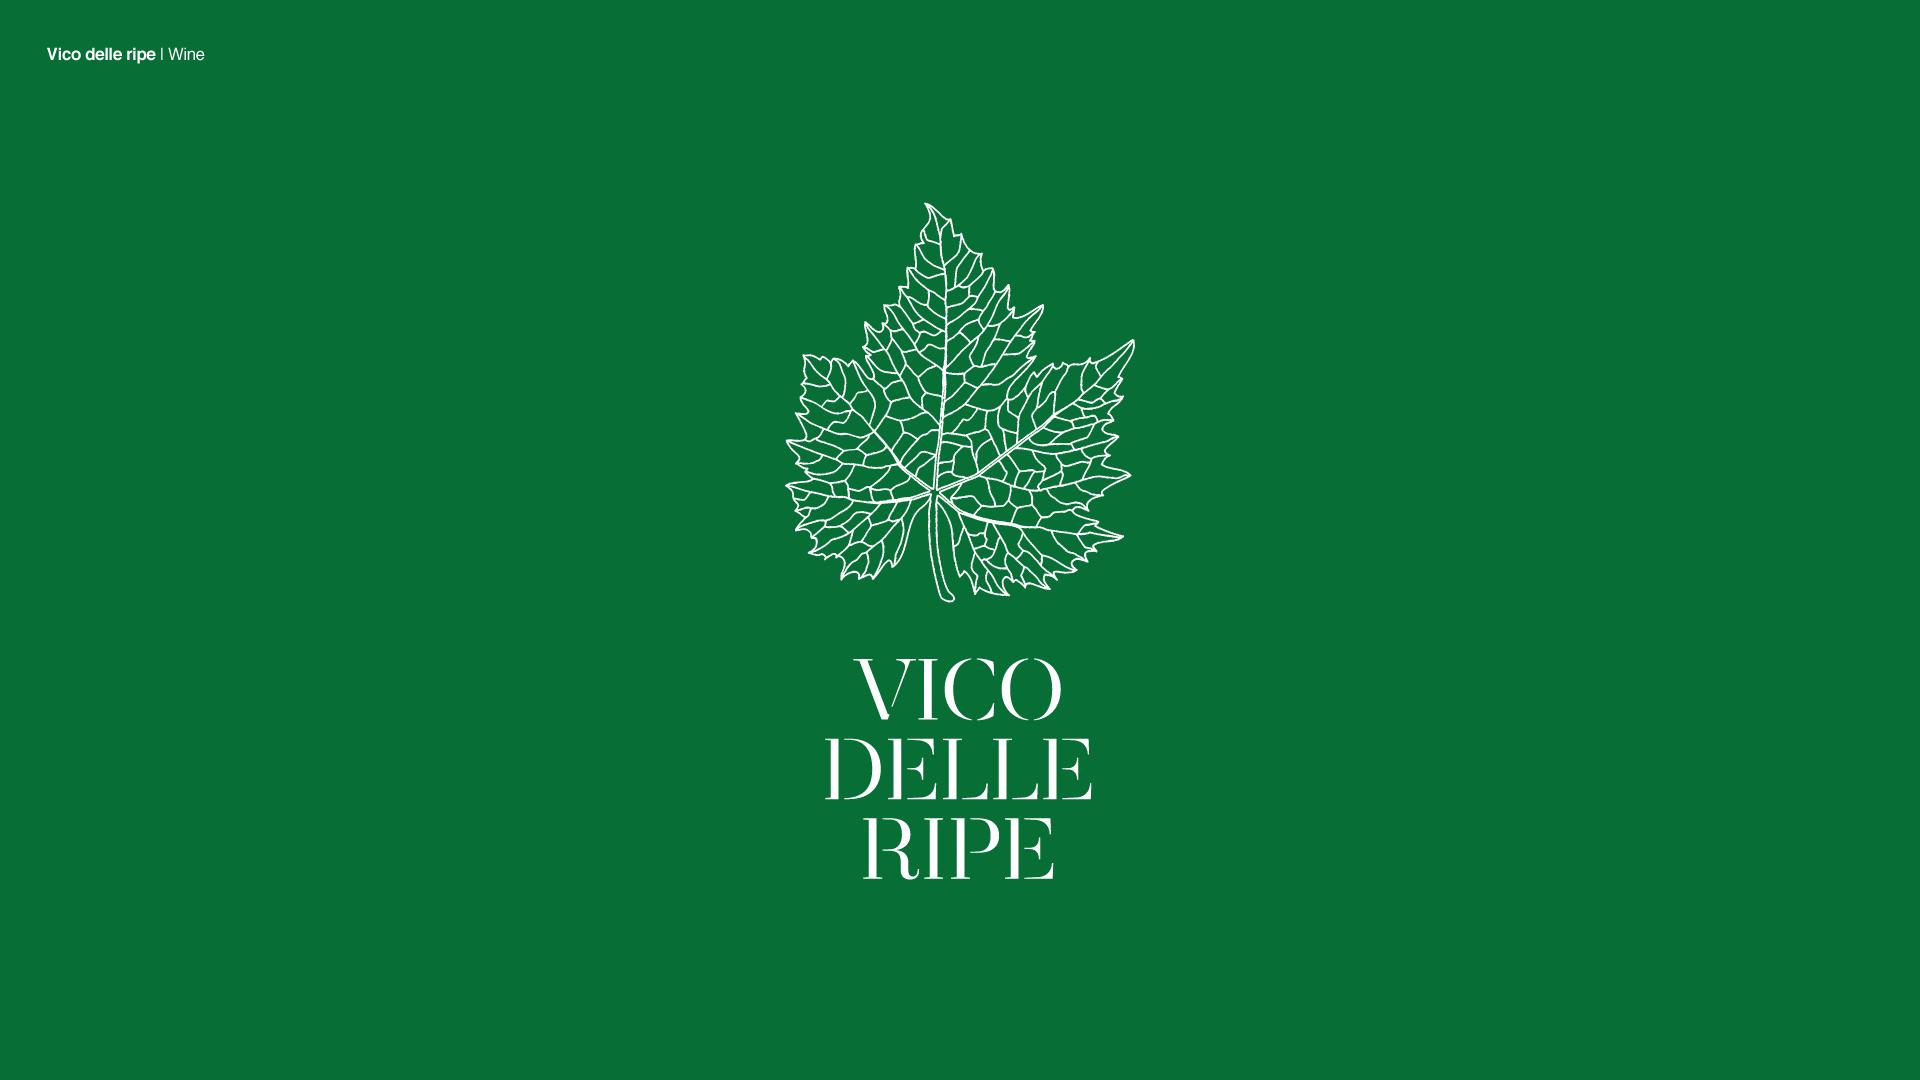 vicodelleripe